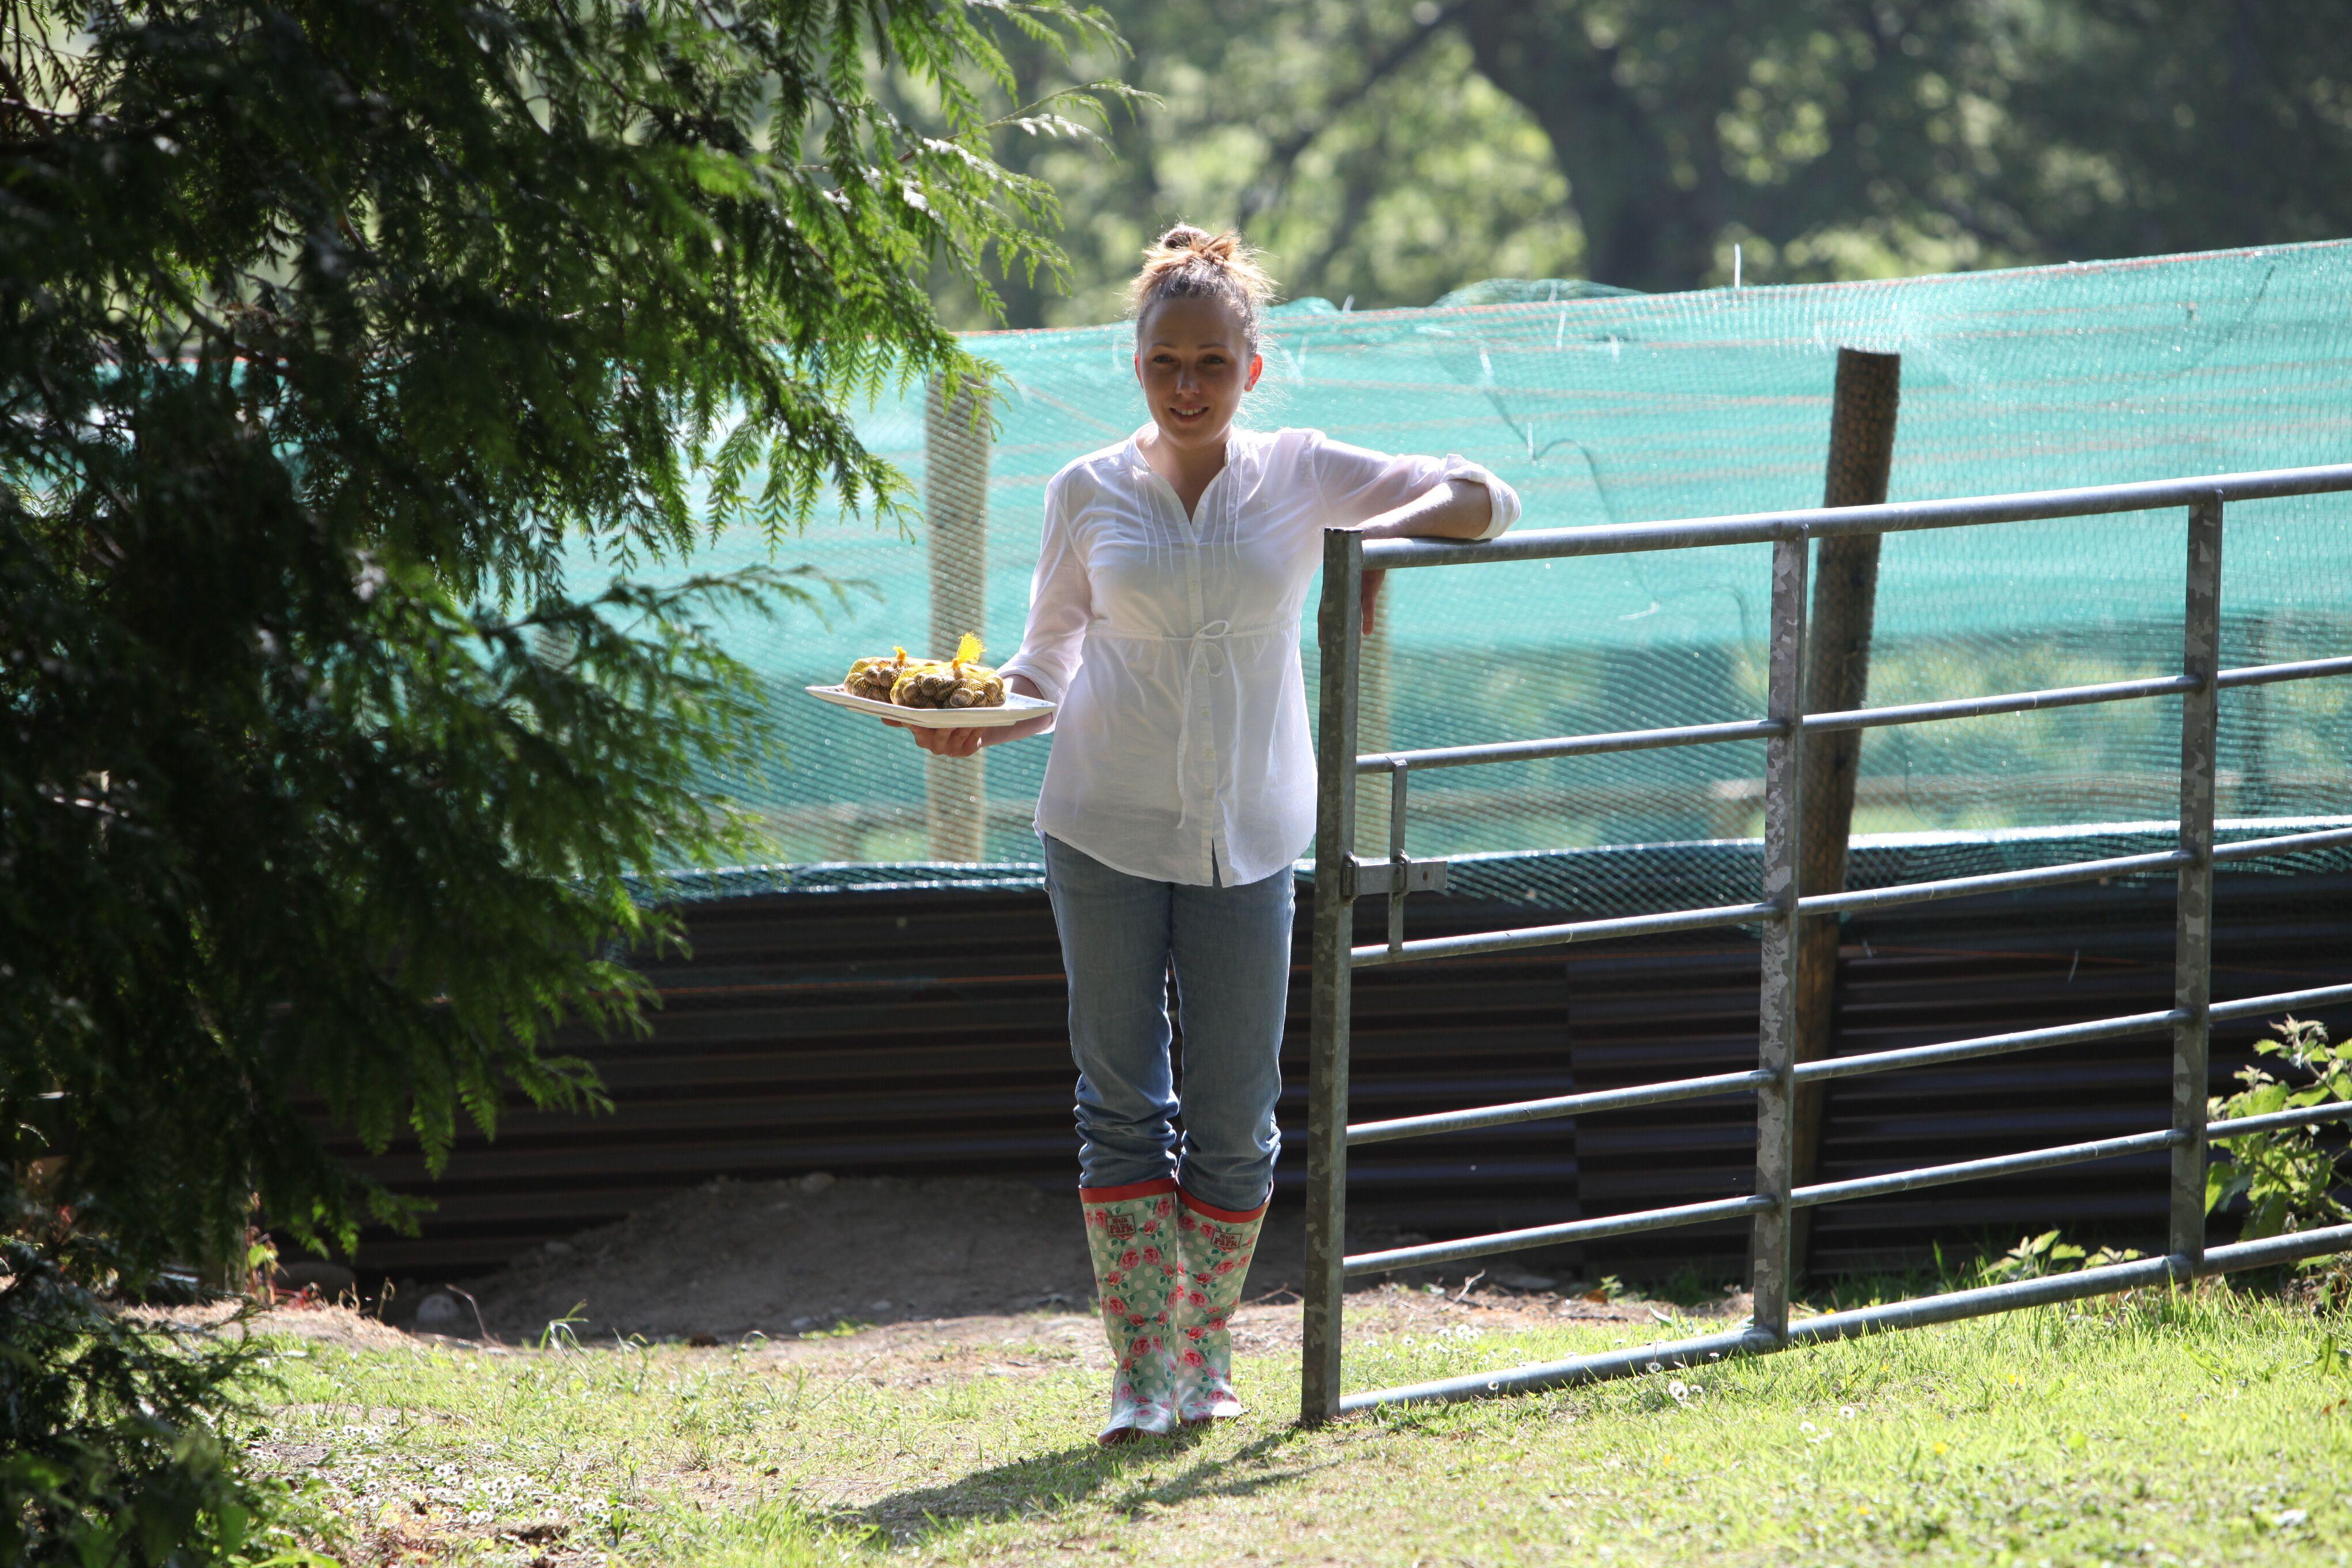 'There is still a perception that farming is for the boys': Eva Milka, snail farmer